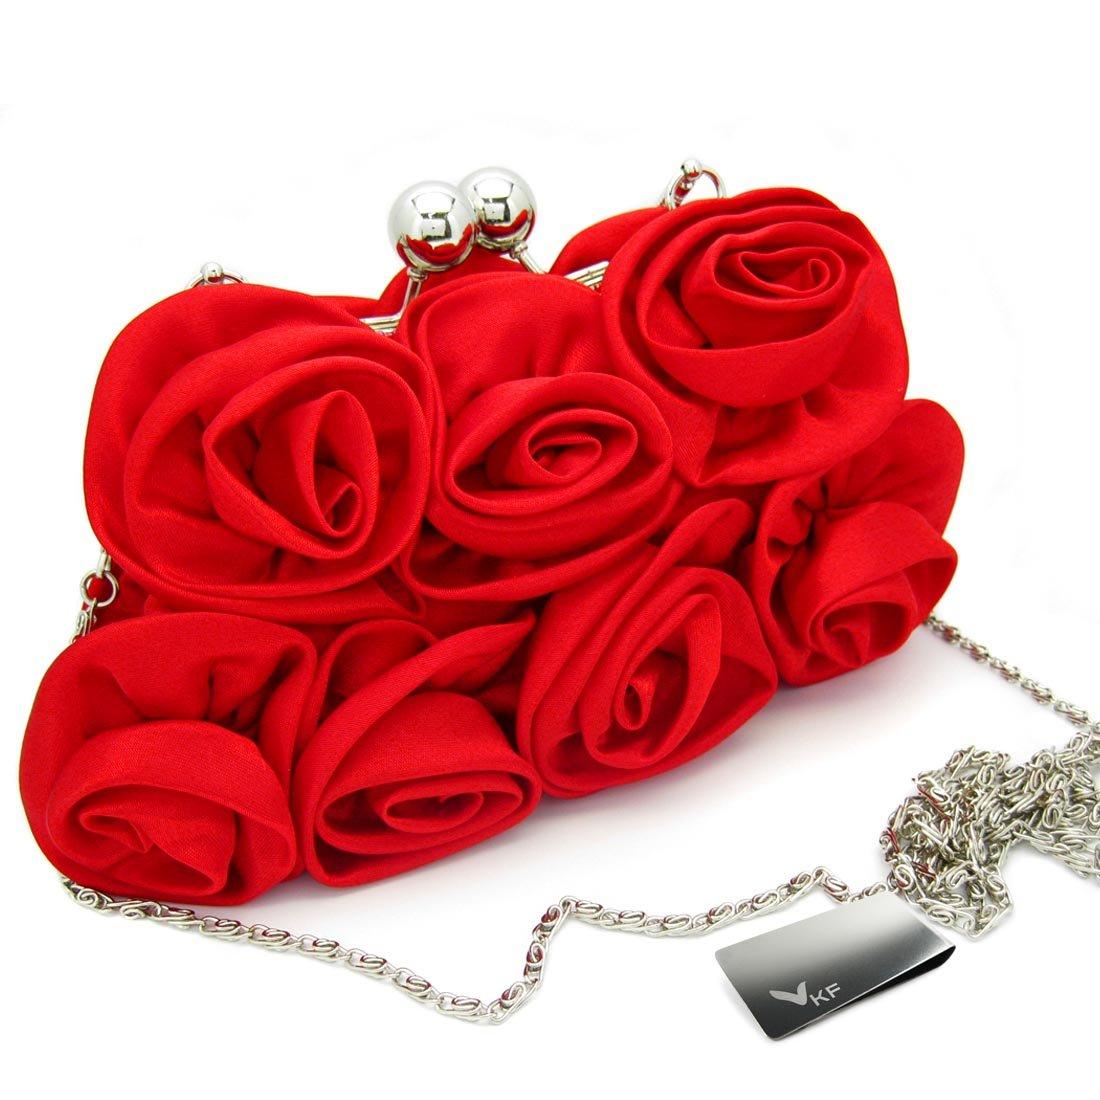 Missy K 7 Roses Clutch...